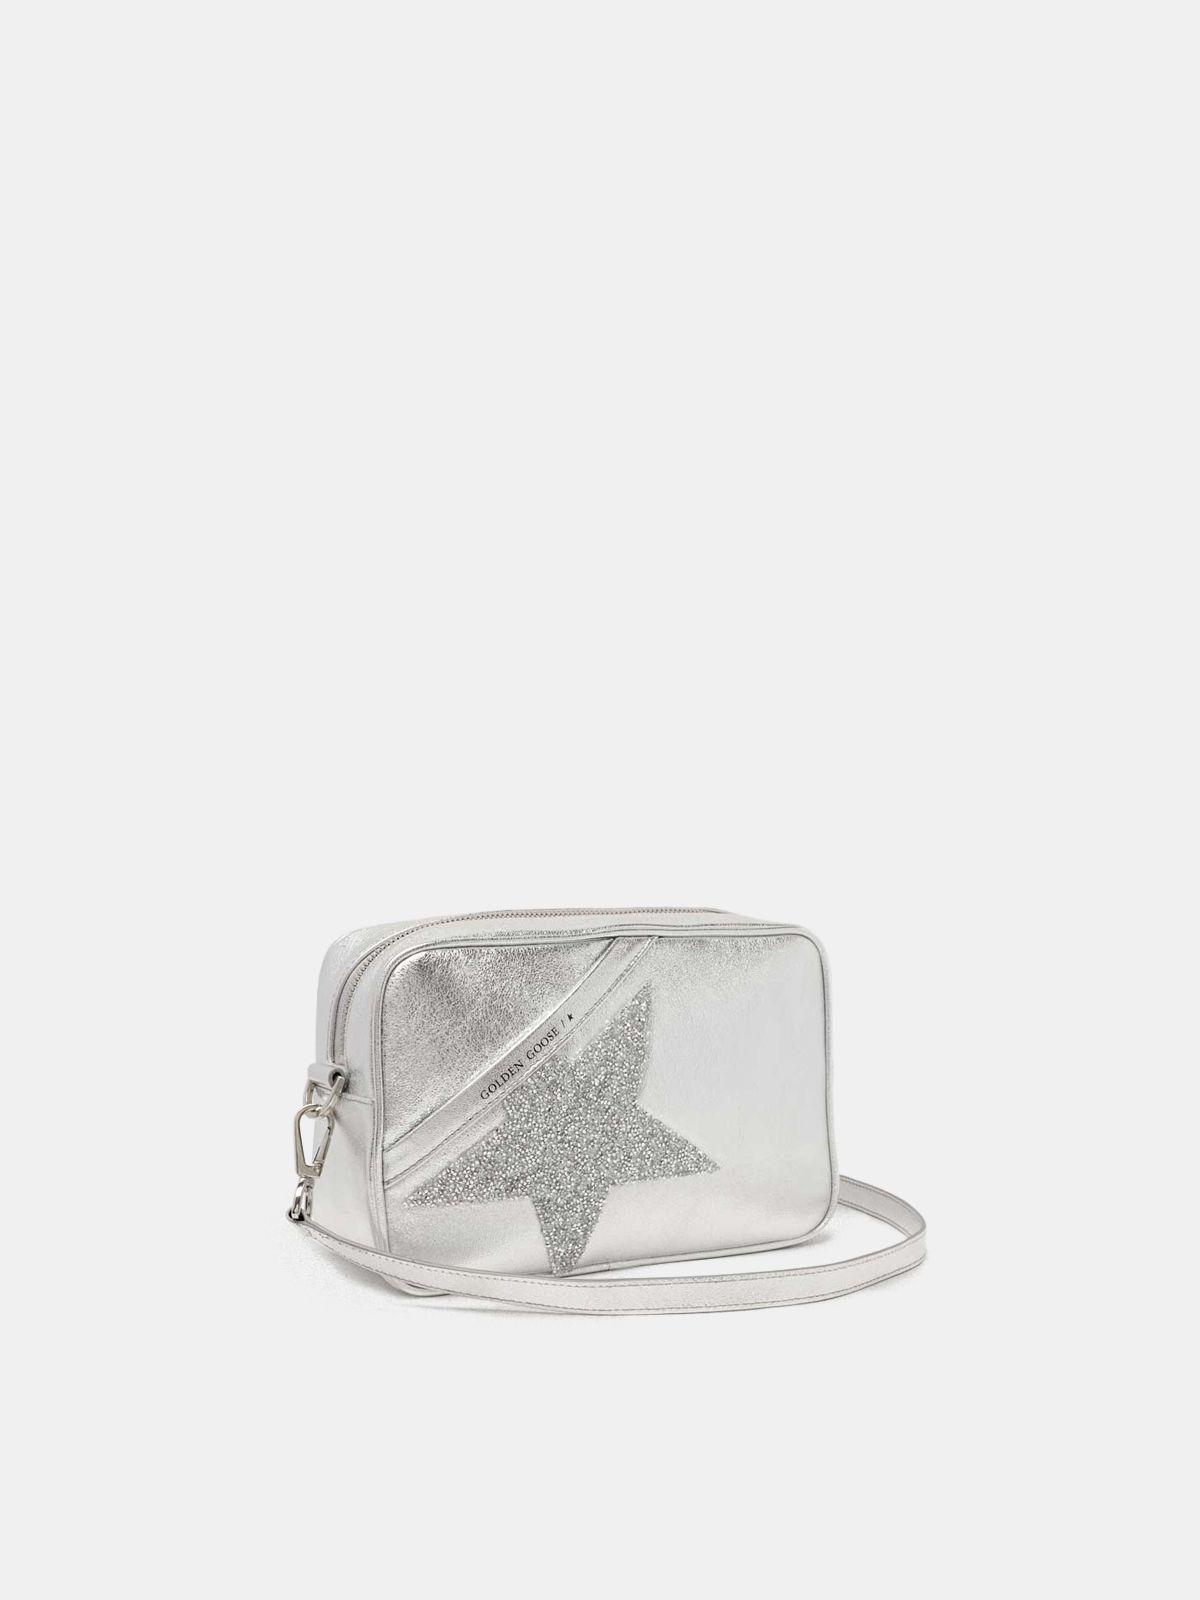 Golden Goose - Borsa Star Bag in pelle laminata con cristalli in